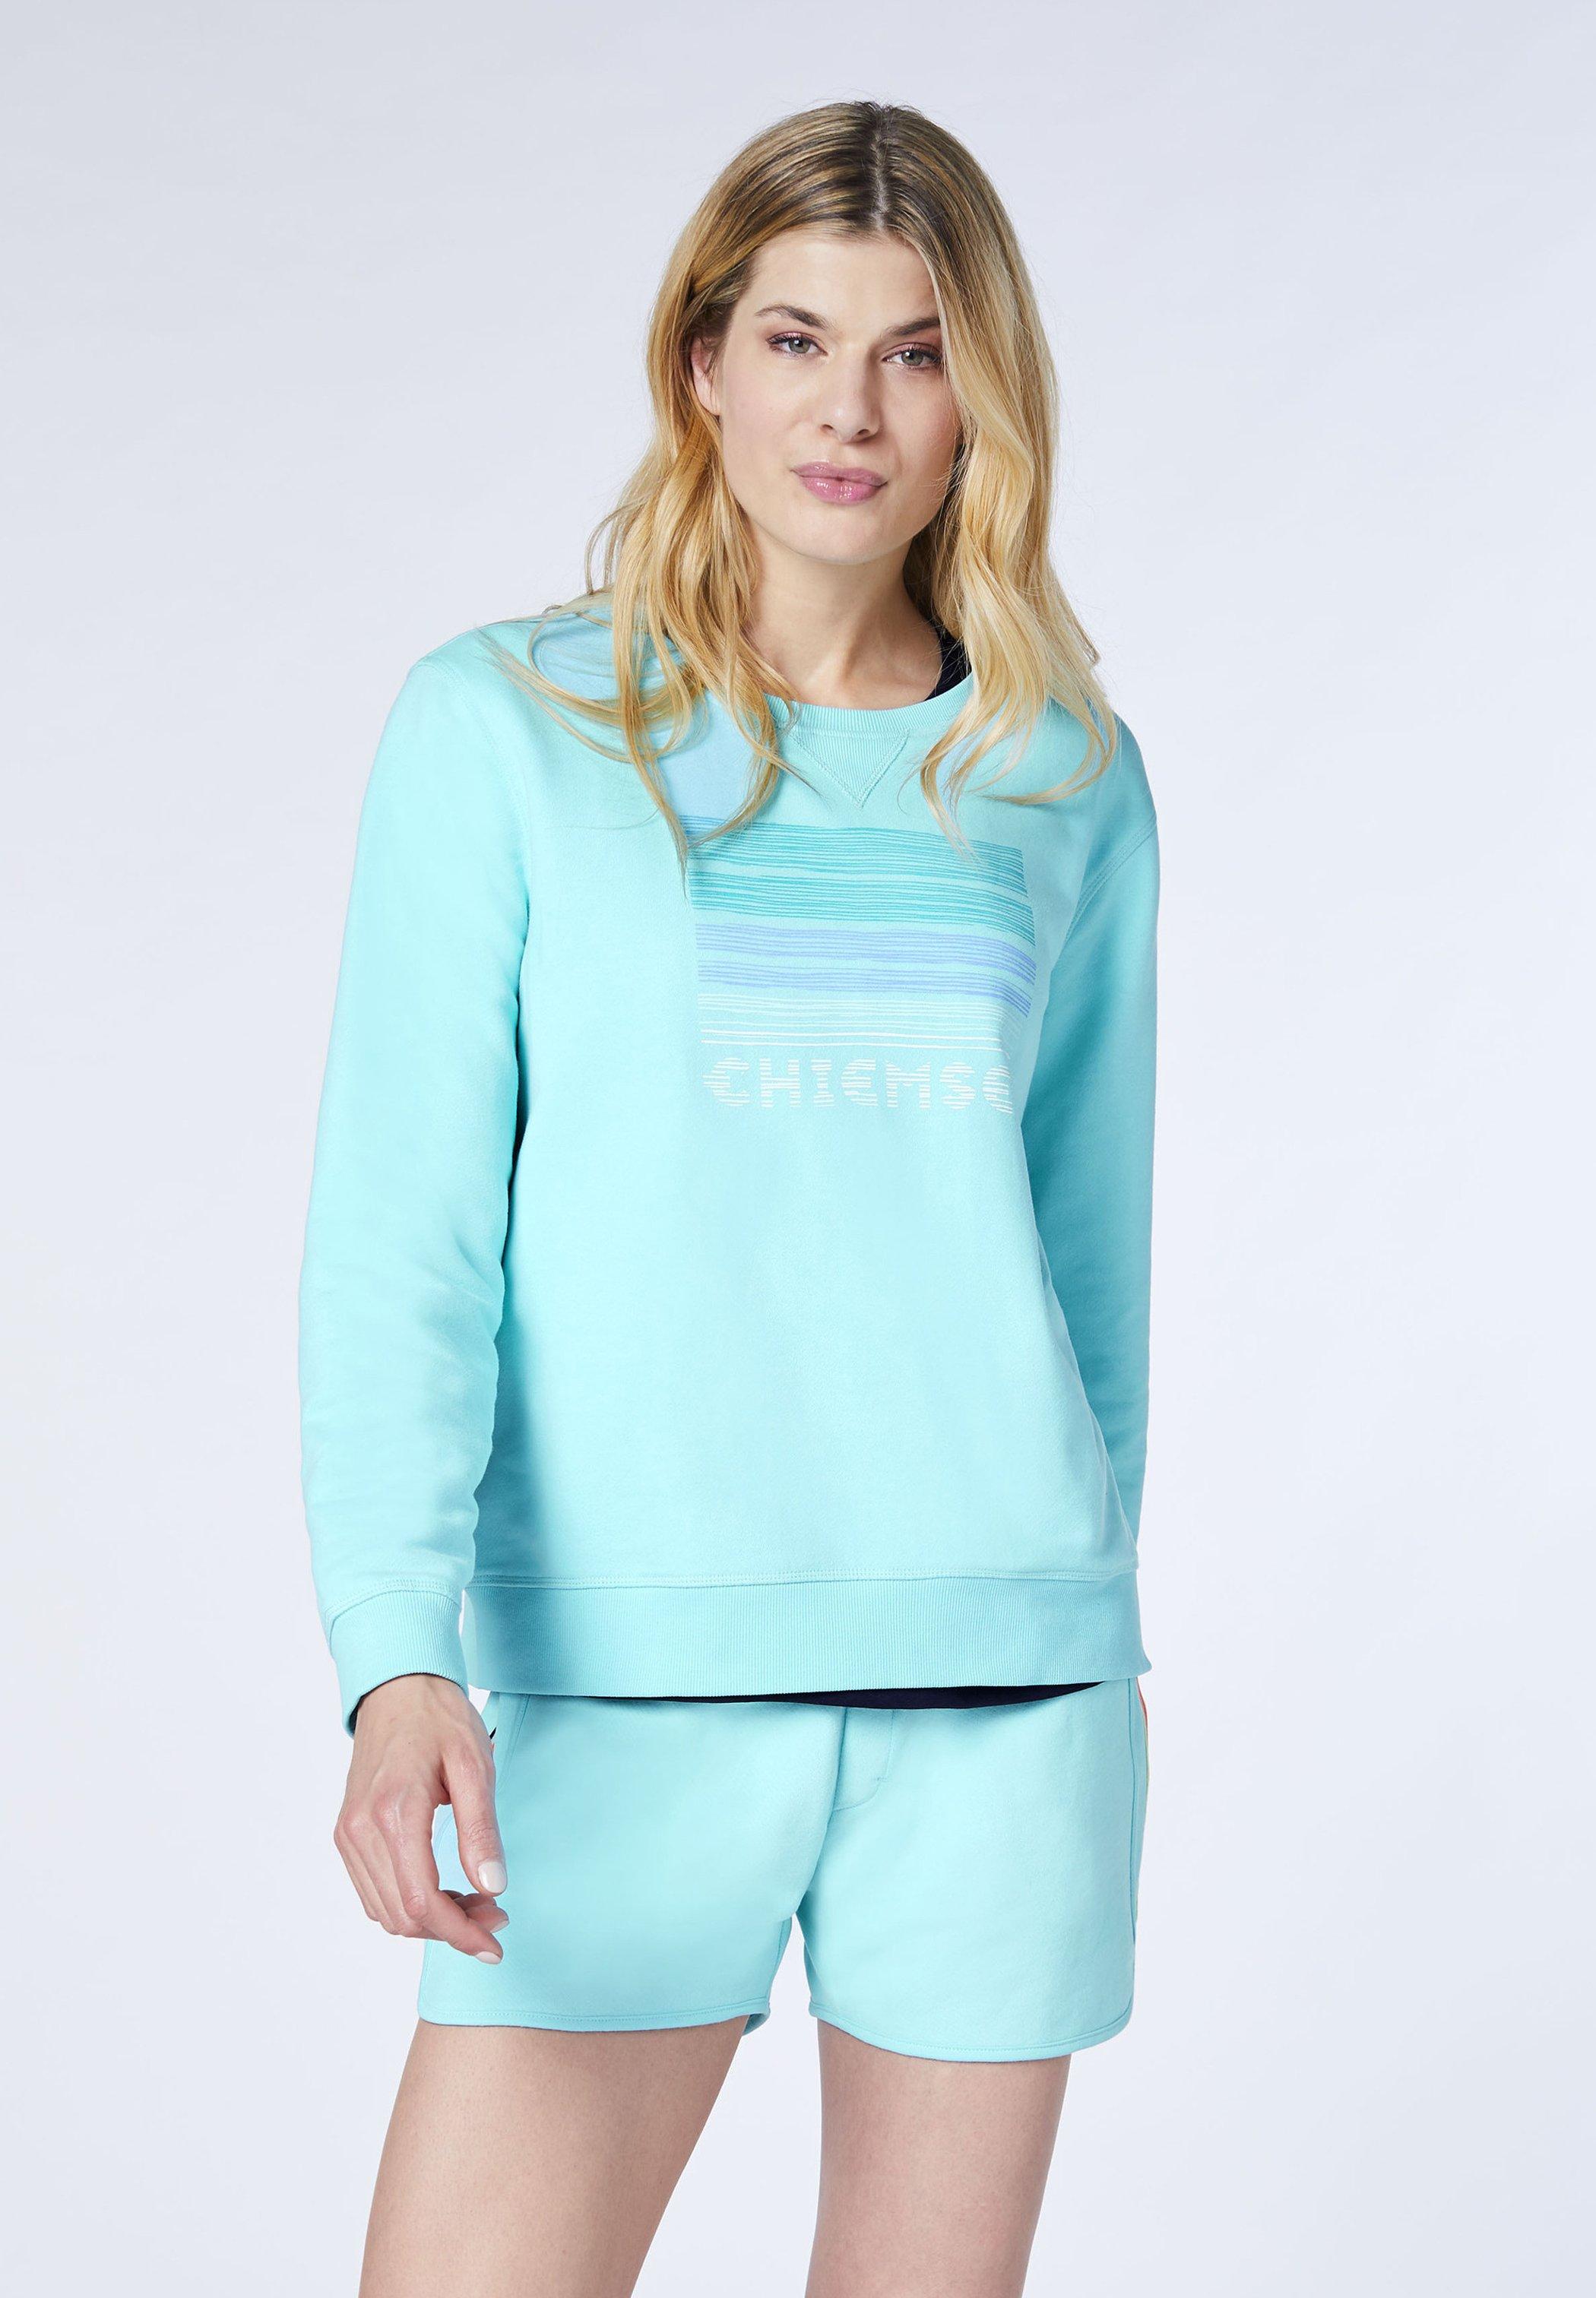 Damen MIT MEHRFARBIGEM FRONTDRUCK - Sweatshirt